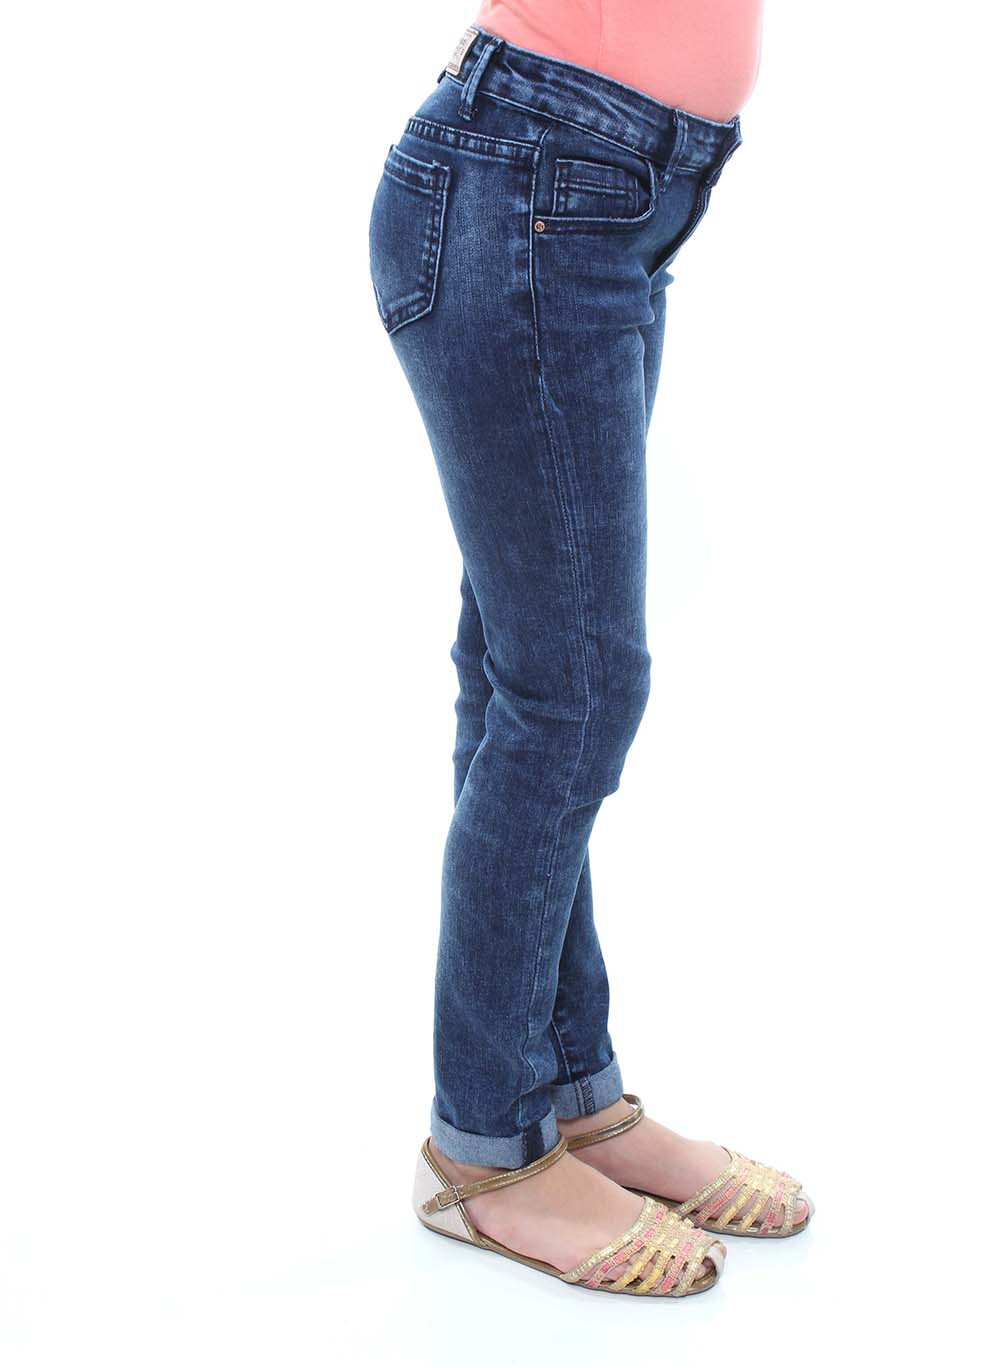 Calça Jeans Skinny Juvenil Feminina Crocker - 45923  - CROCKER JEANS